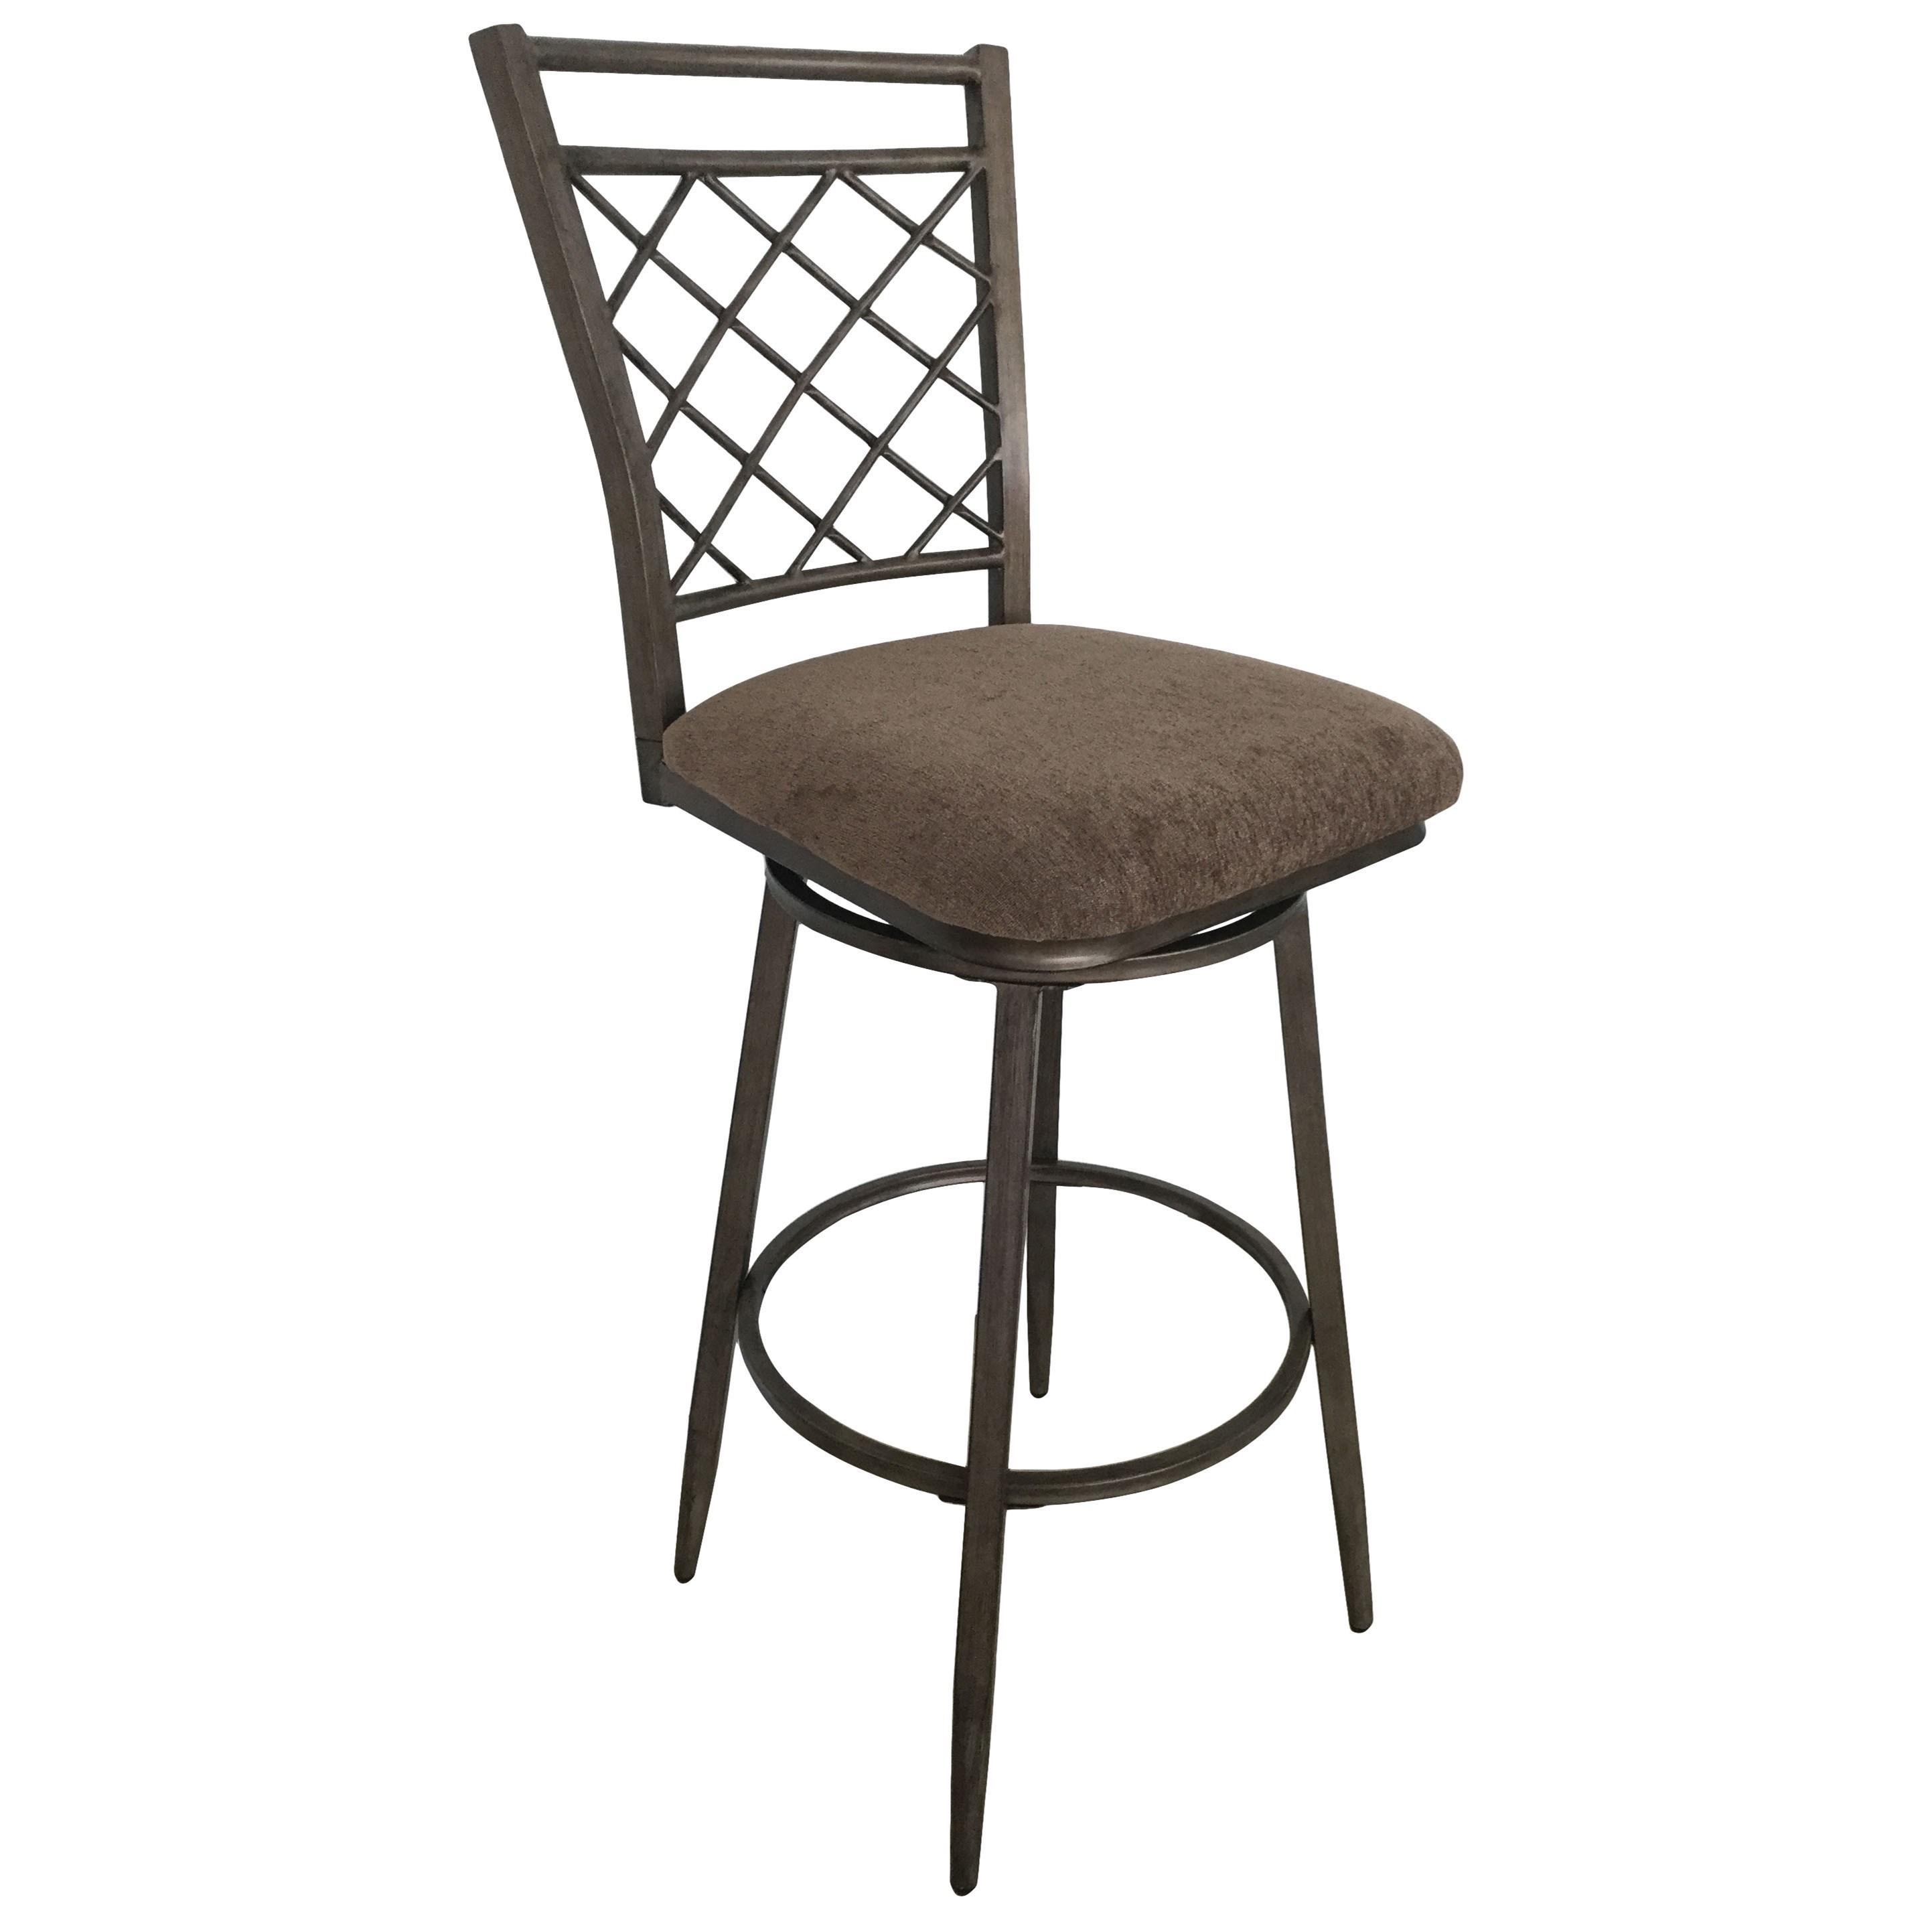 Aldric Bar Stool by Acme Furniture at Carolina Direct